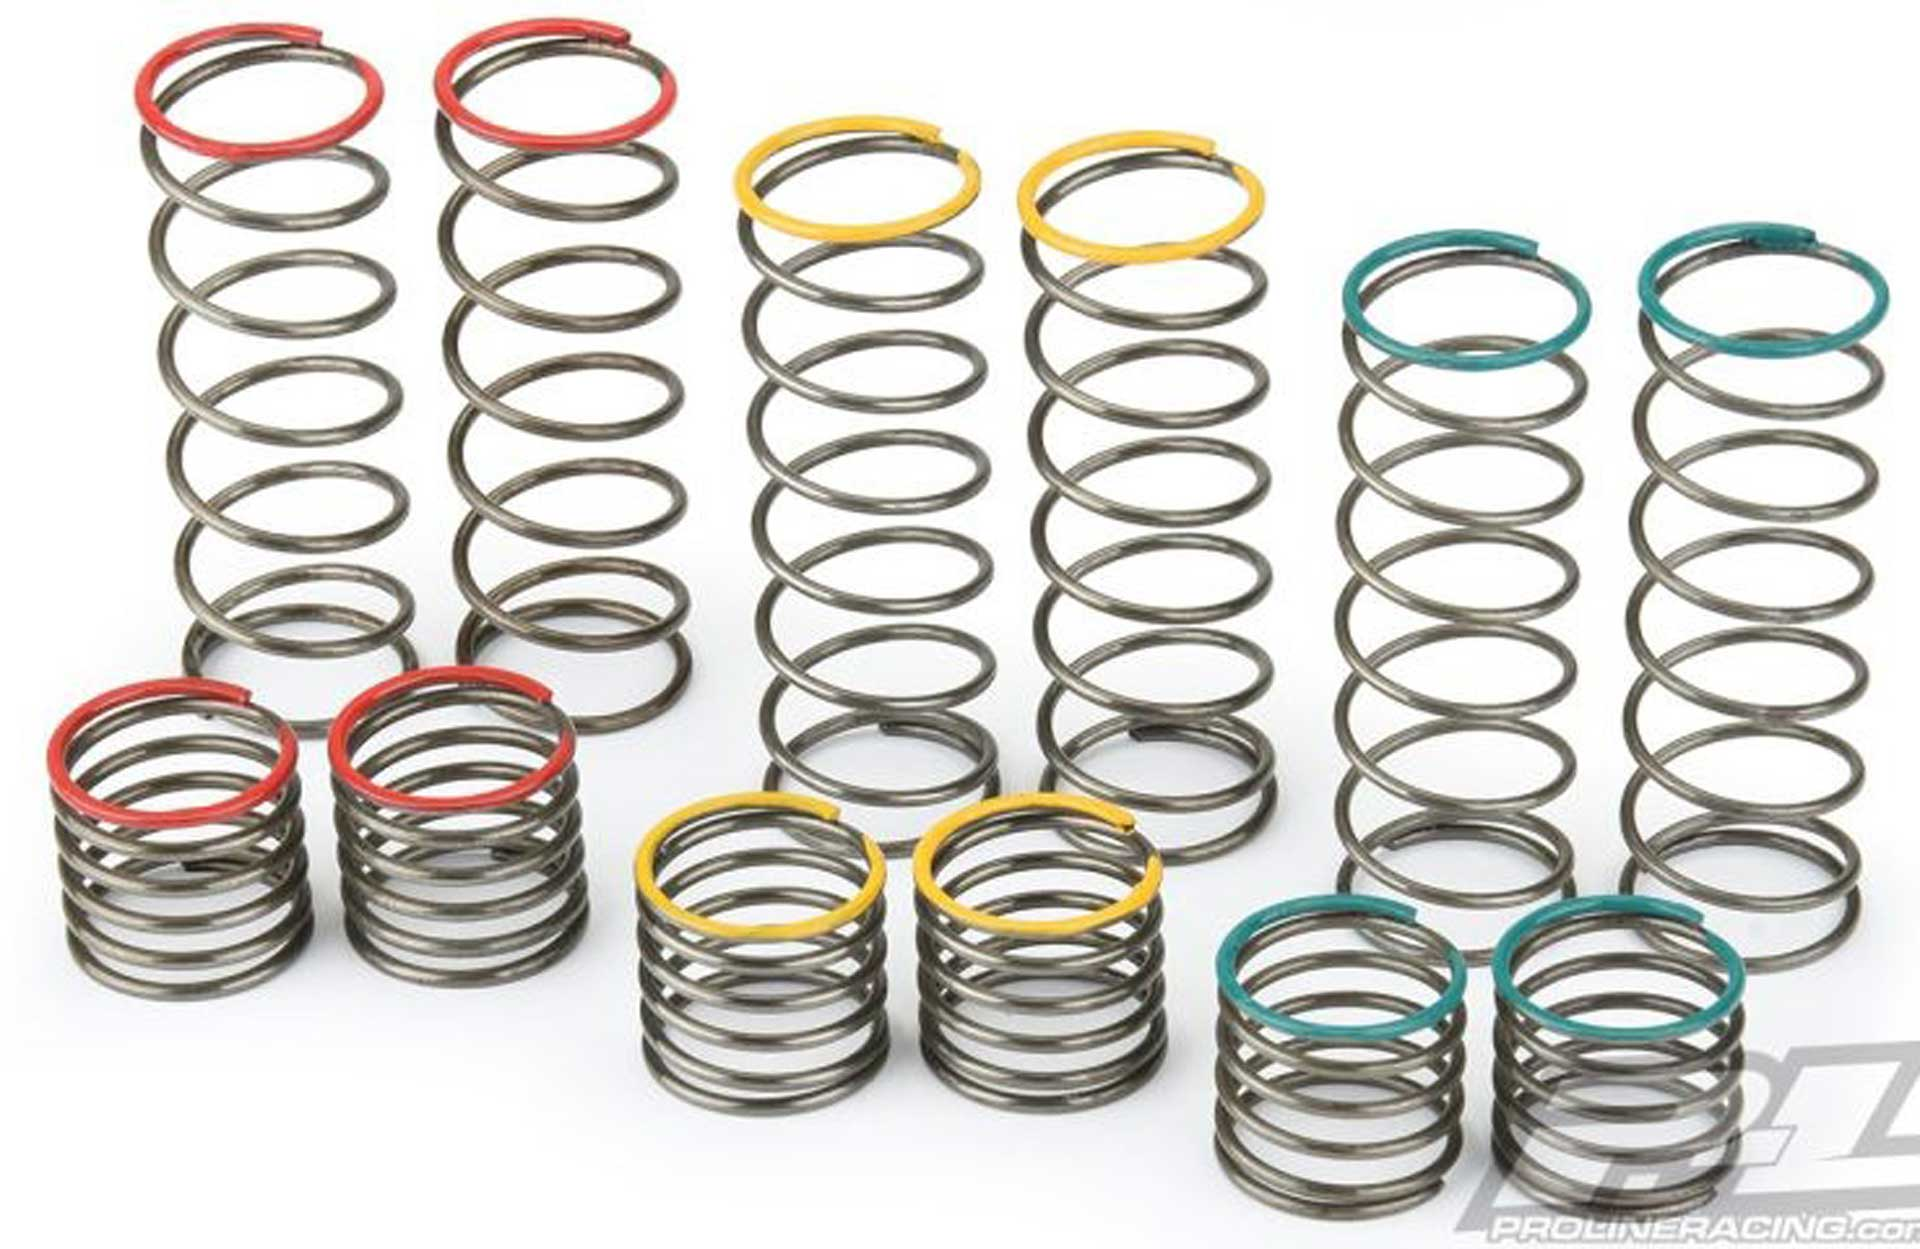 PROLINE Powerstroke rear shock spring set ARRMA damper 6359-01